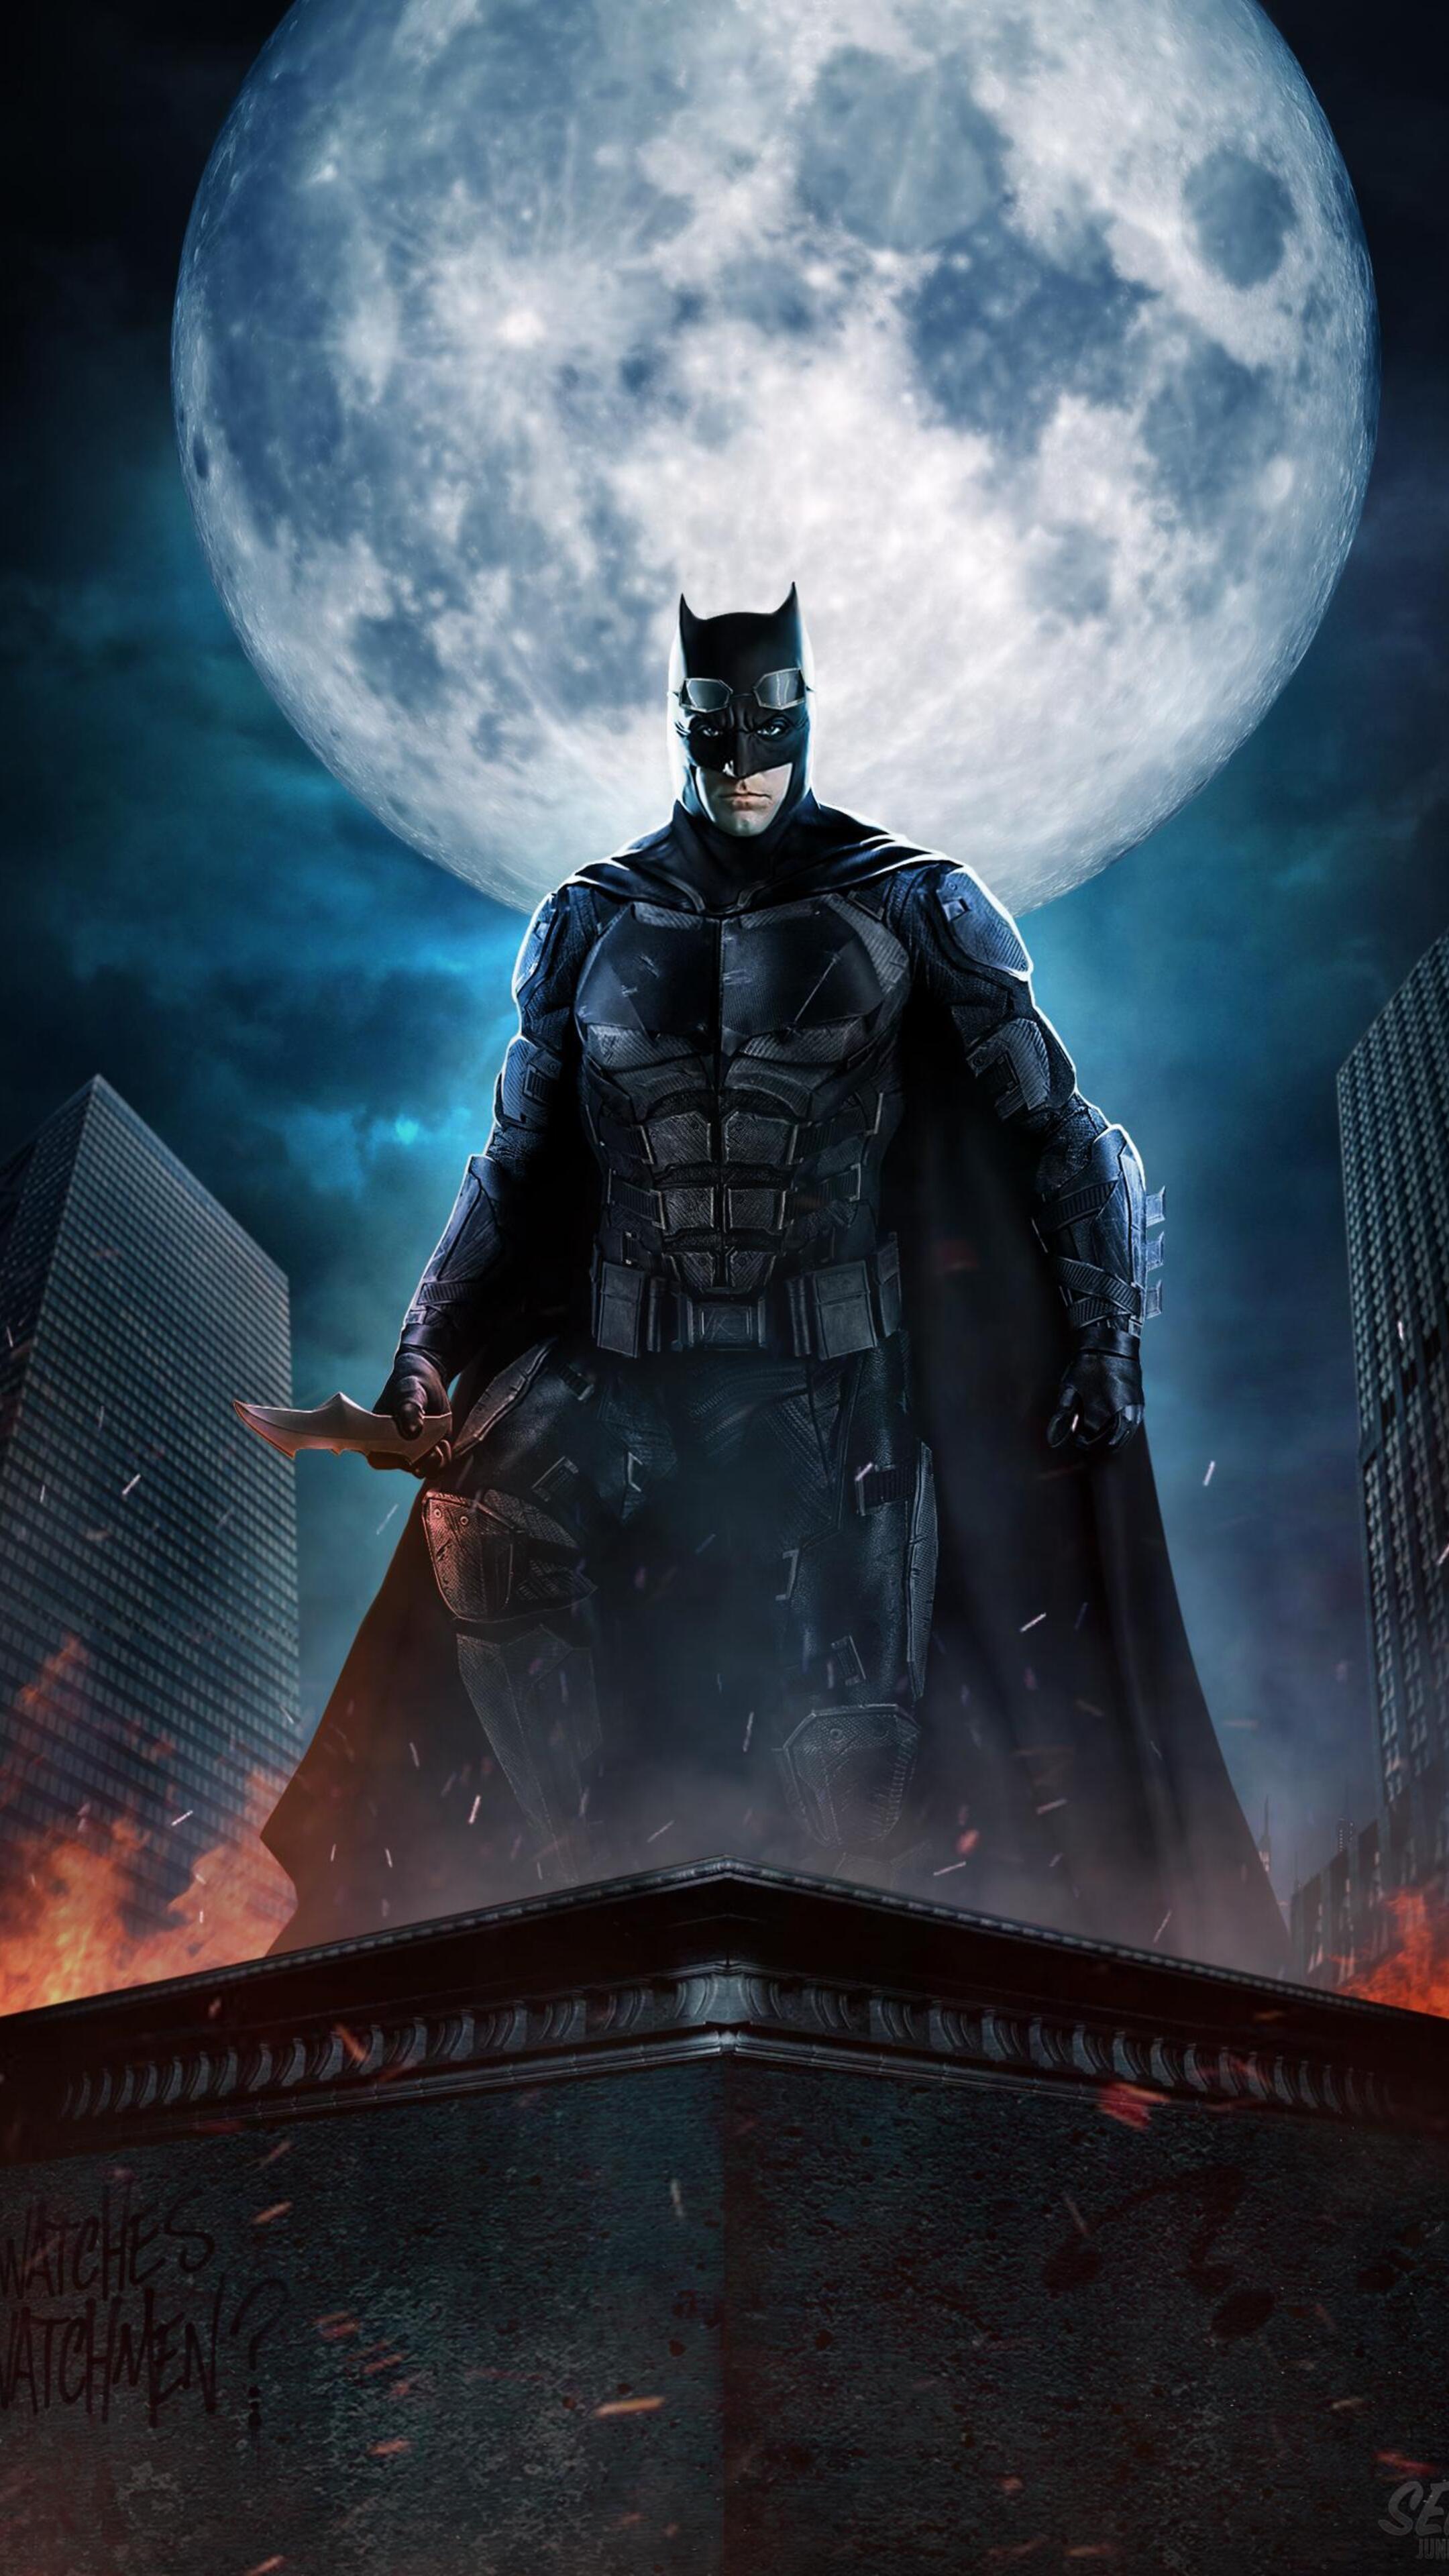 2160x3840 justice league batman the dark knight fan art - Art wallpaper 2160x3840 ...